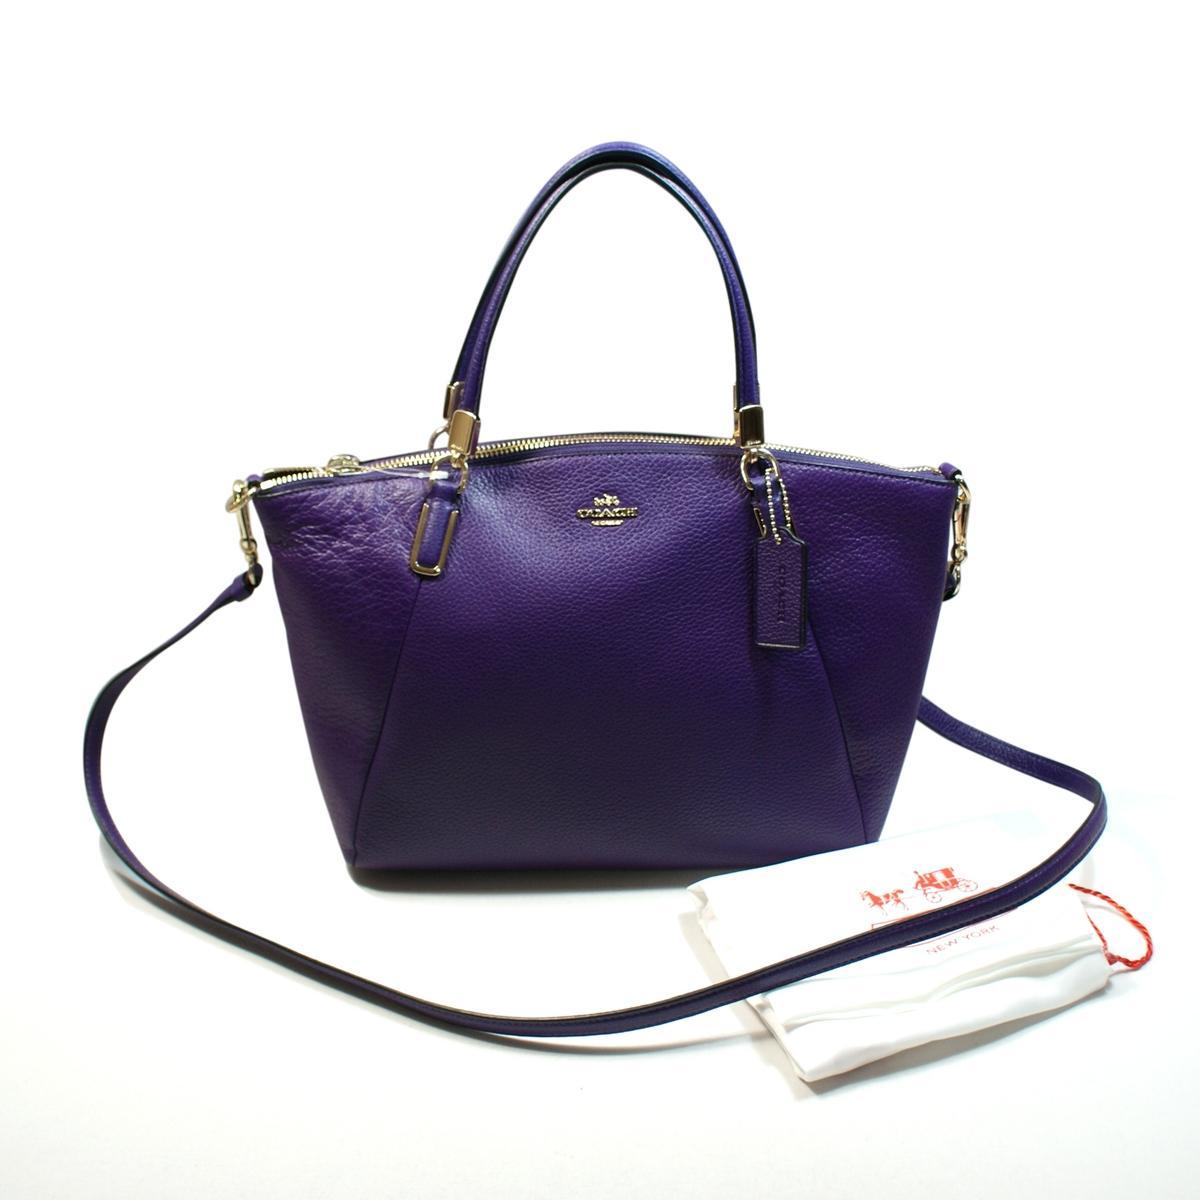 Coach Pebbled Leather Small Kelsey Violet Handbag